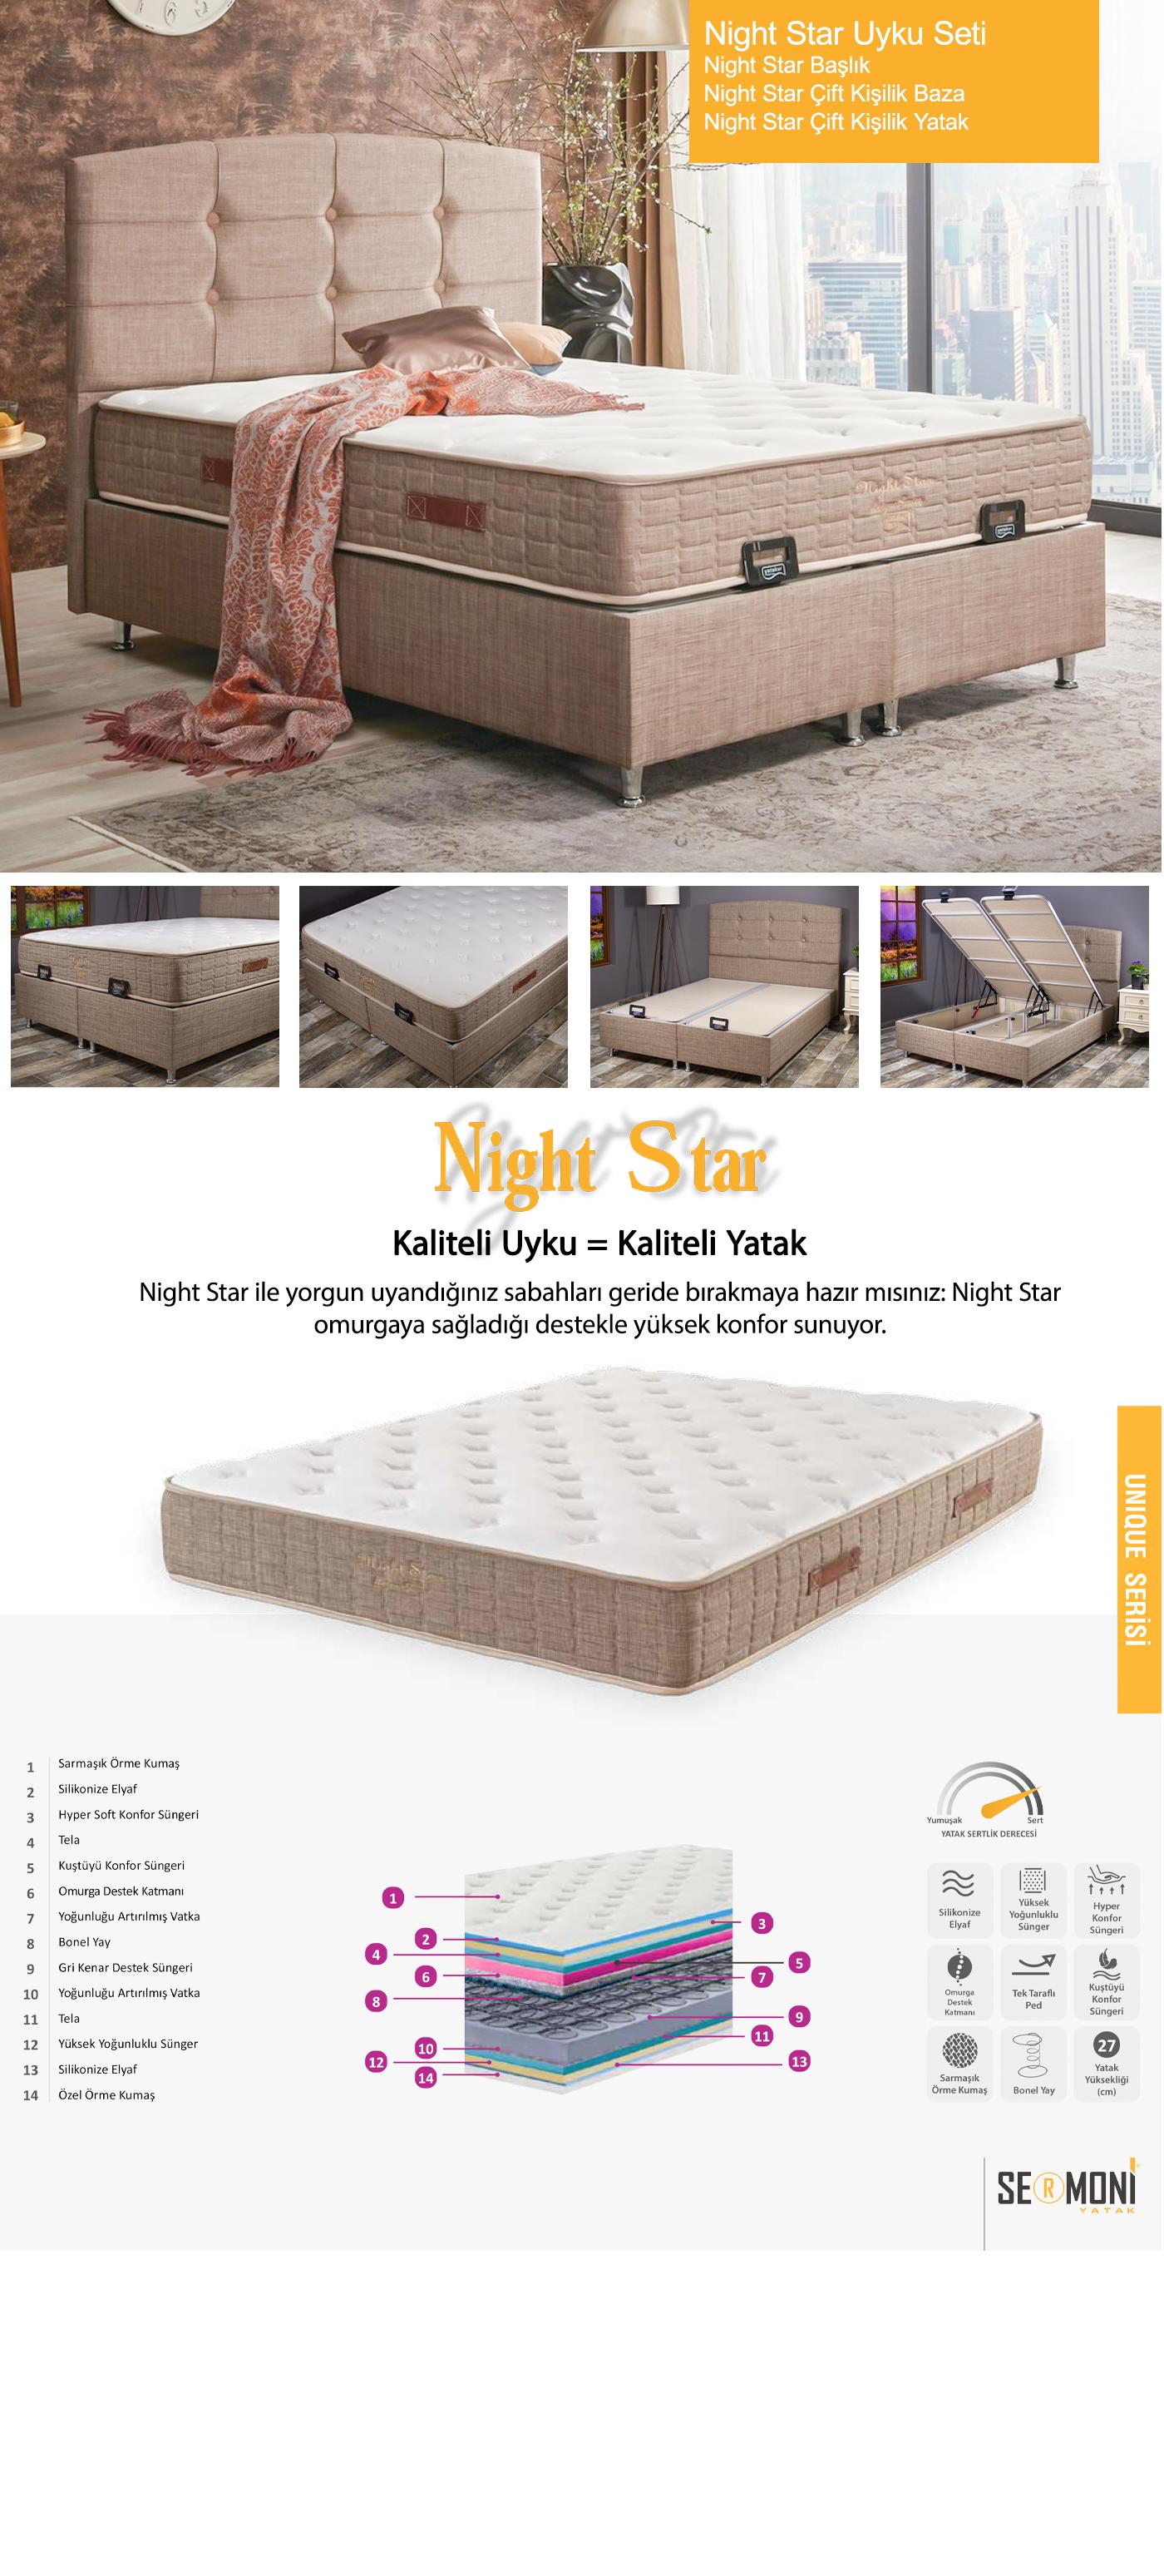 Night Star Yatak